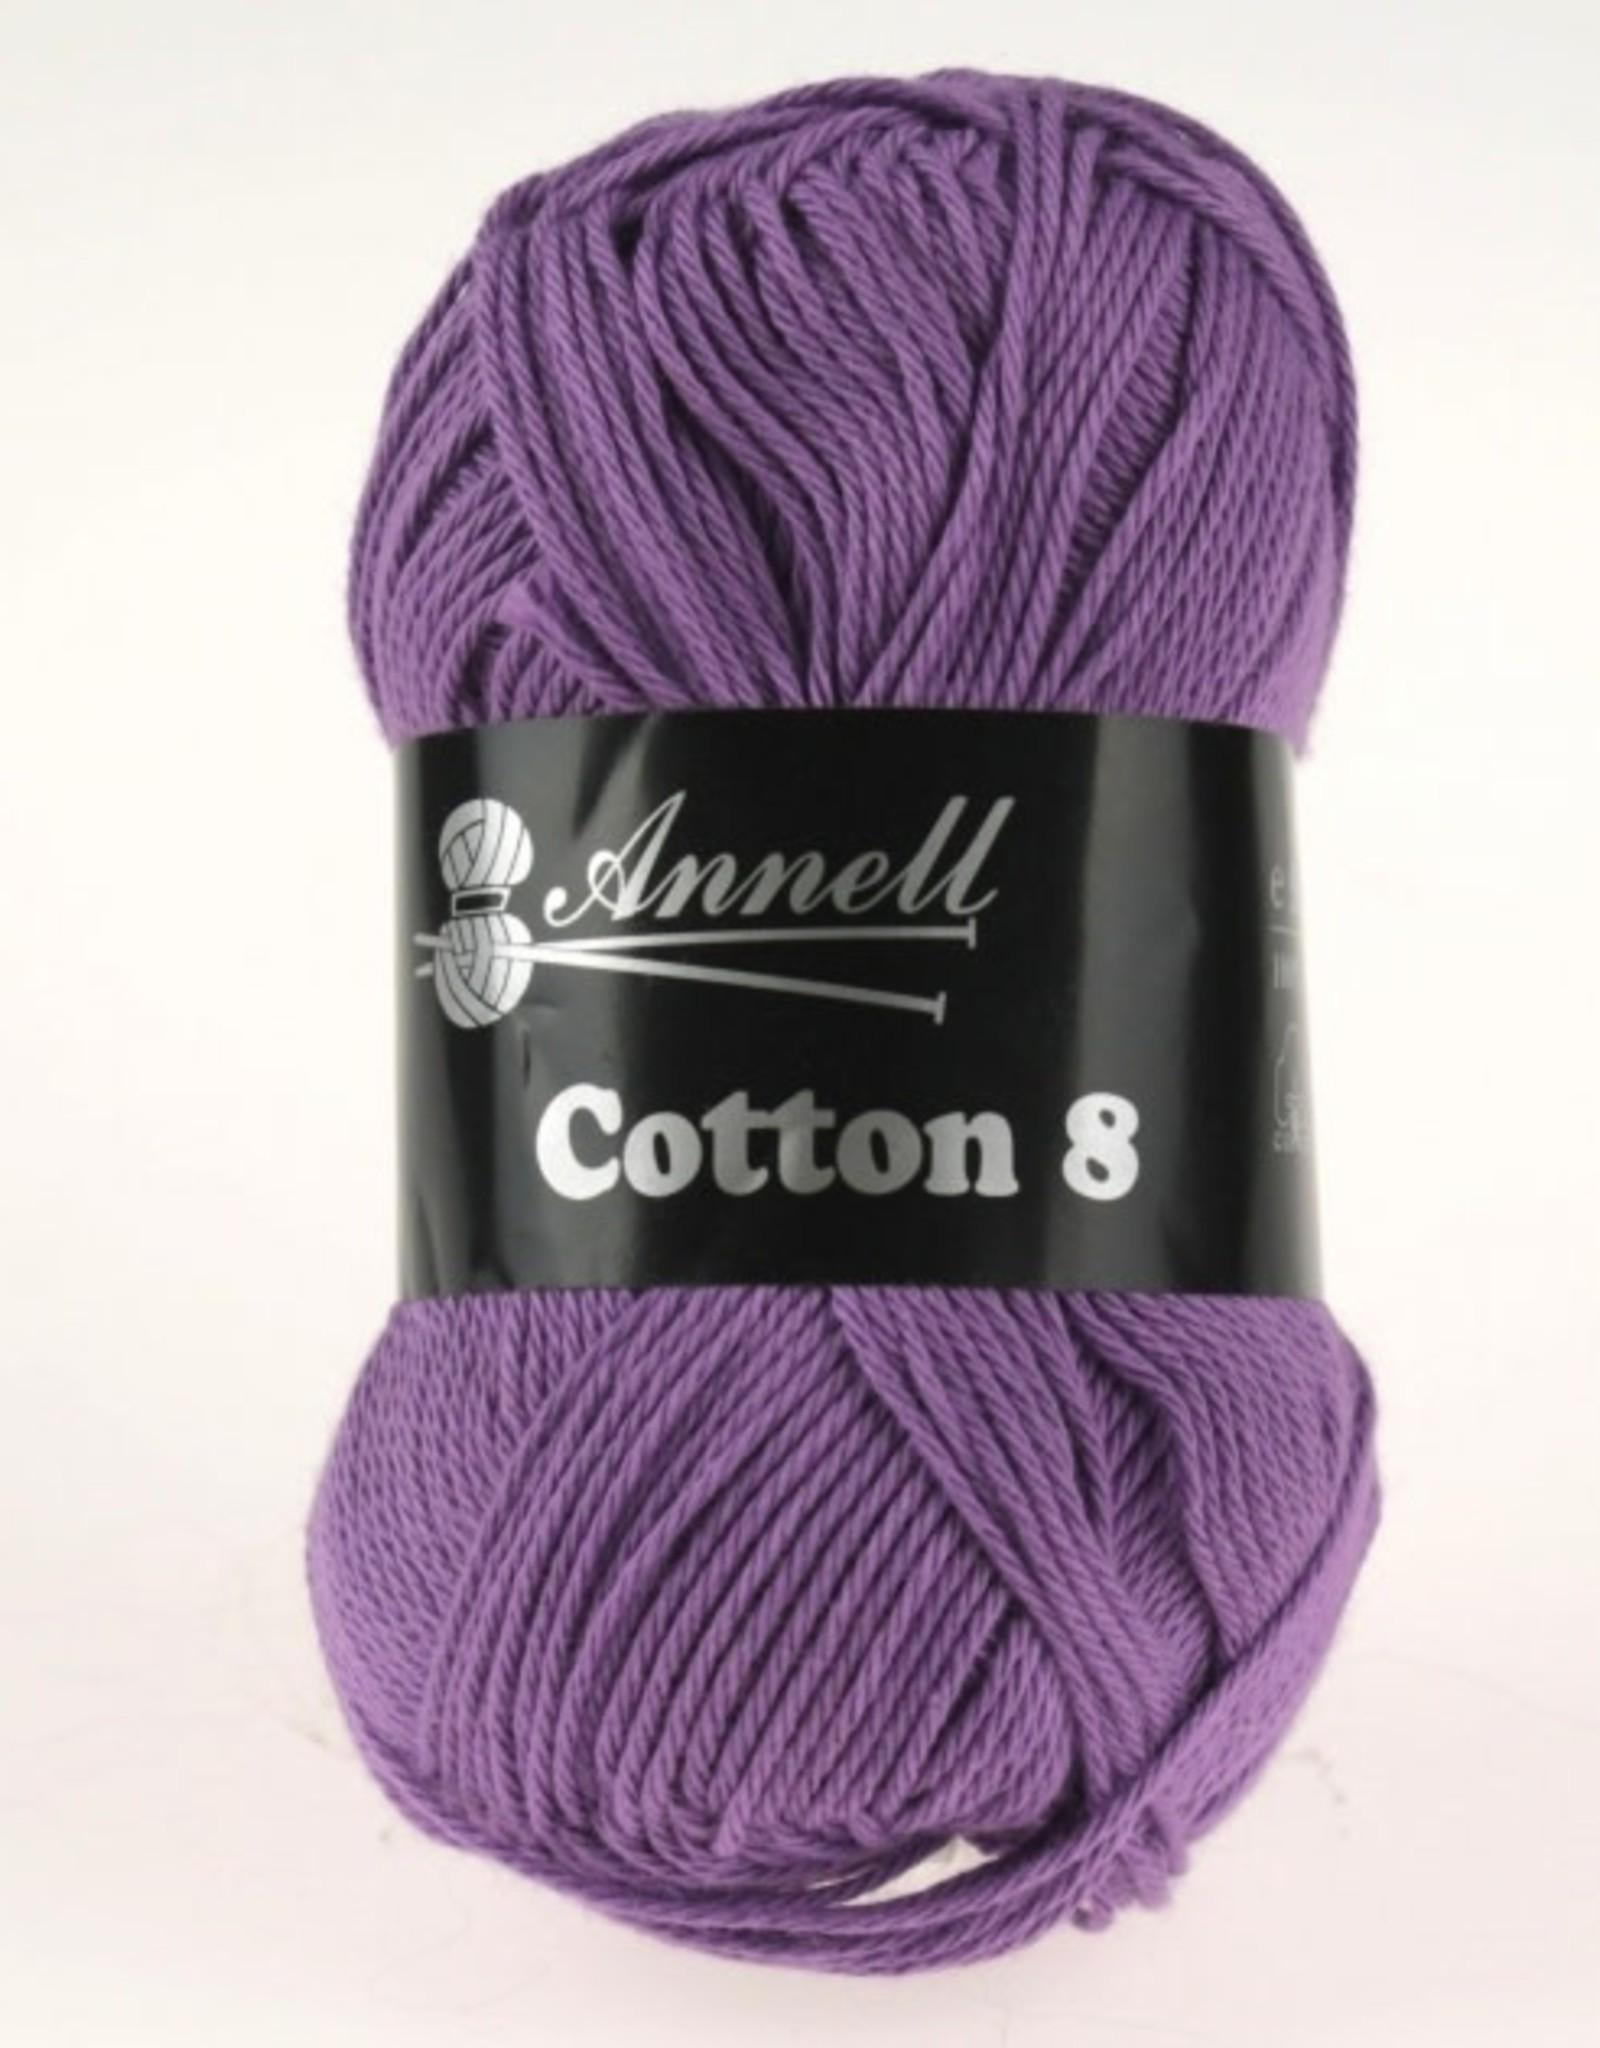 Annell Annell Cotton 8 53